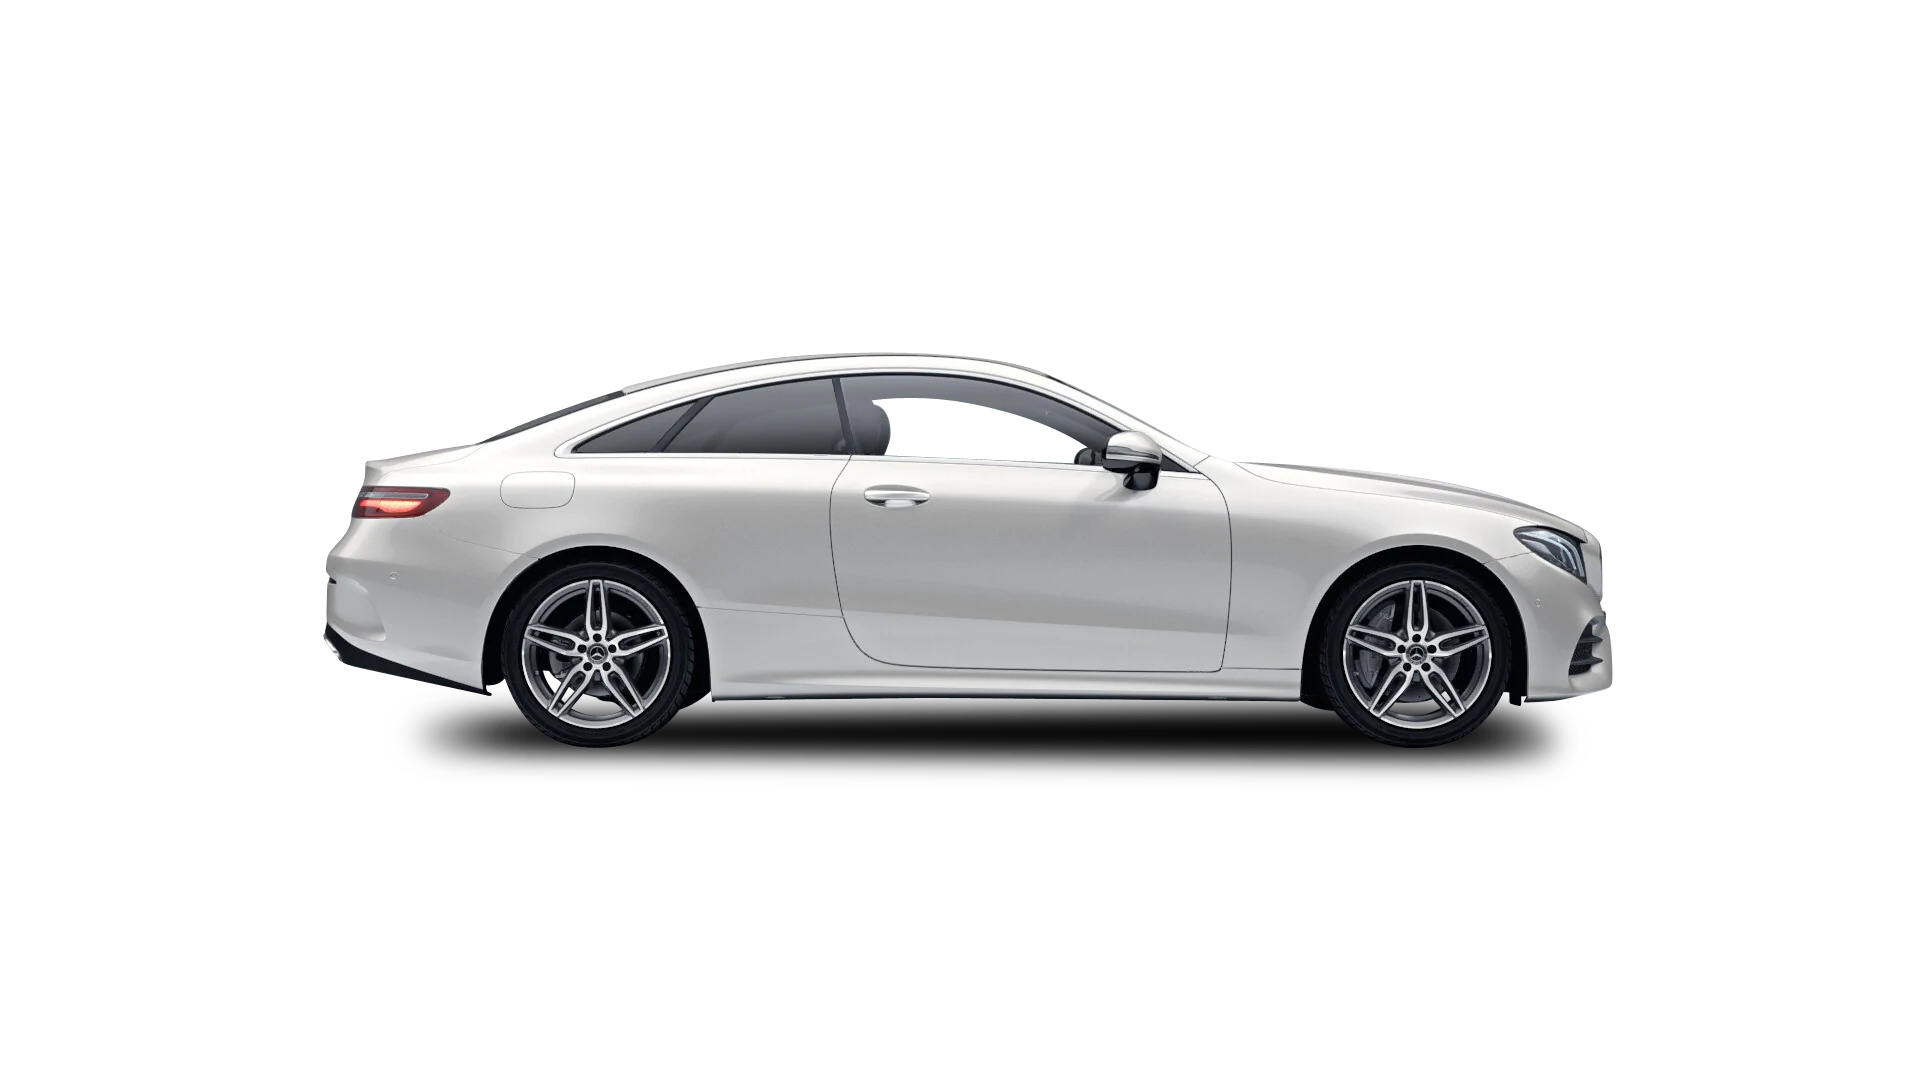 https://cogcms-images.azureedge.net/media/35318/e-class-coupe-amg-line-premium.png